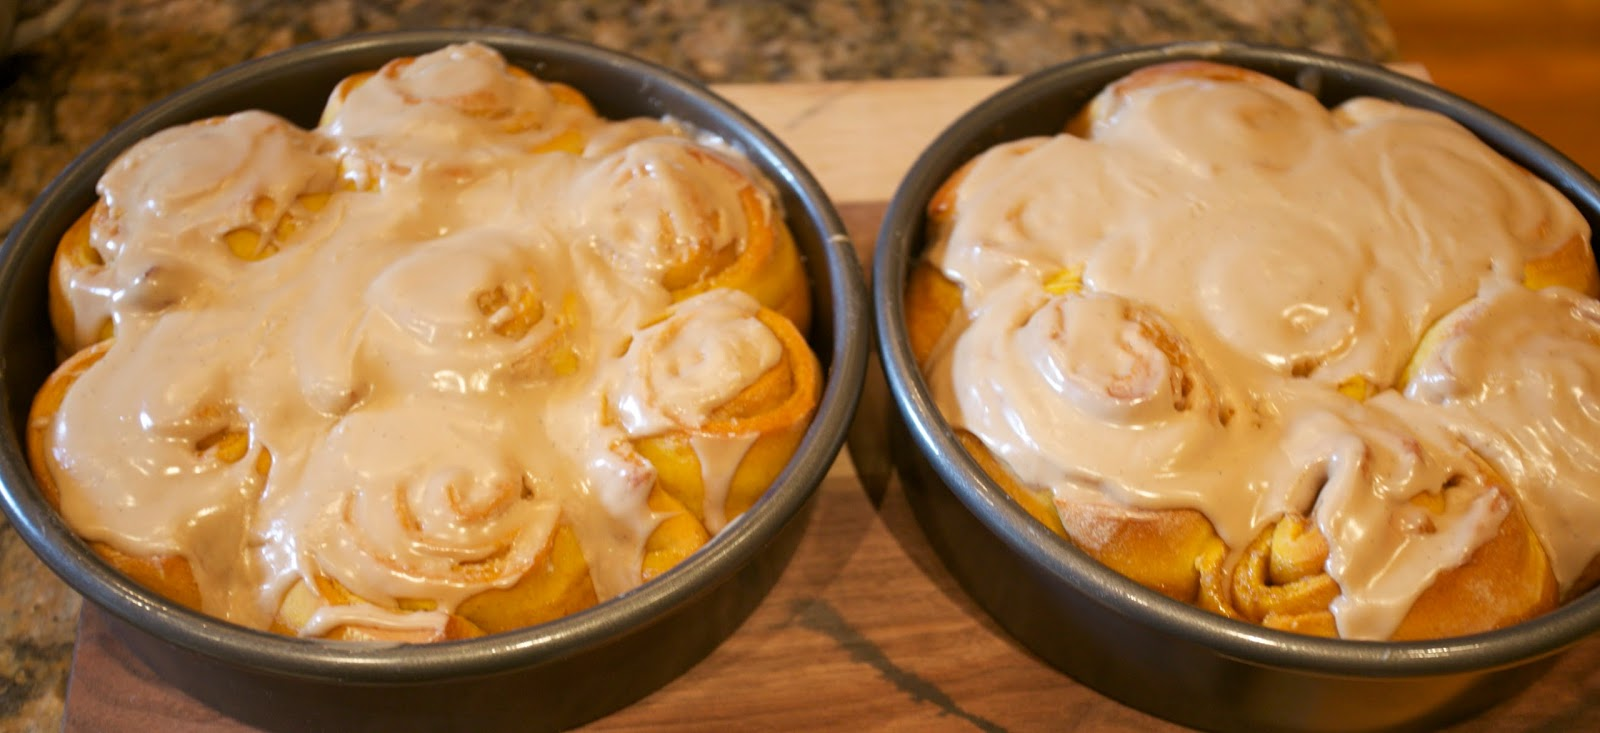 Octoberfarm: Pumpkin Cinnamon Rolls with Maple Frosting